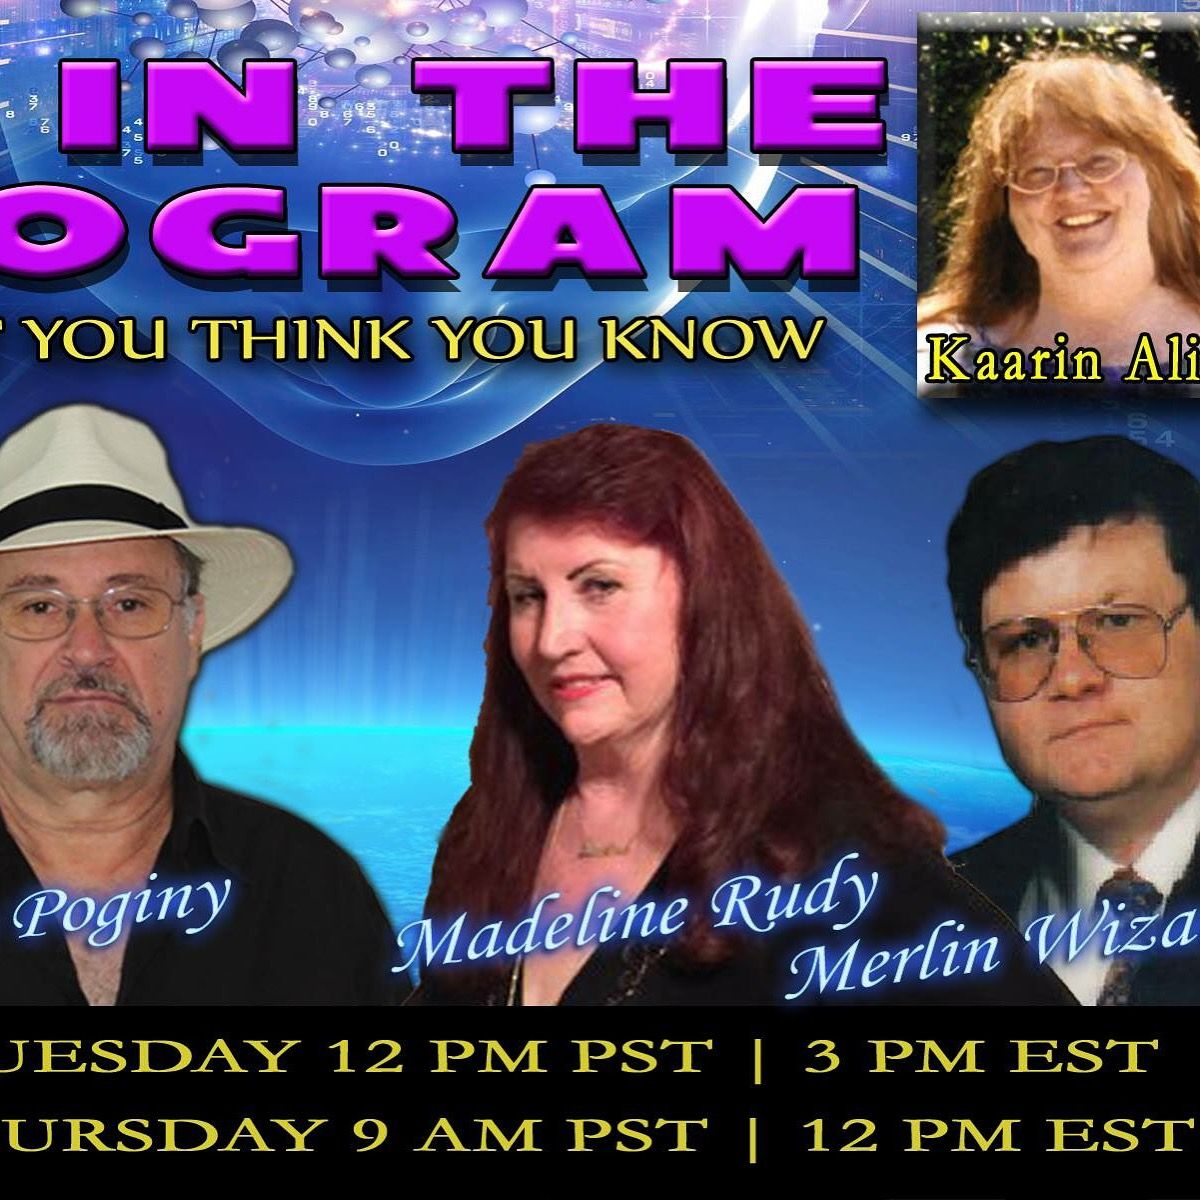 http://kcorradio.com/KCOR/Podcasts/Life-In-The-Hologram/2016/February/Kaarin-Alisa-In-The-Hologram-Madeline-Rudy-Merlin-Wizard-KCOR-Digital-Radio-Network.mp3 #kcor #talkradio#slimroastcoffee